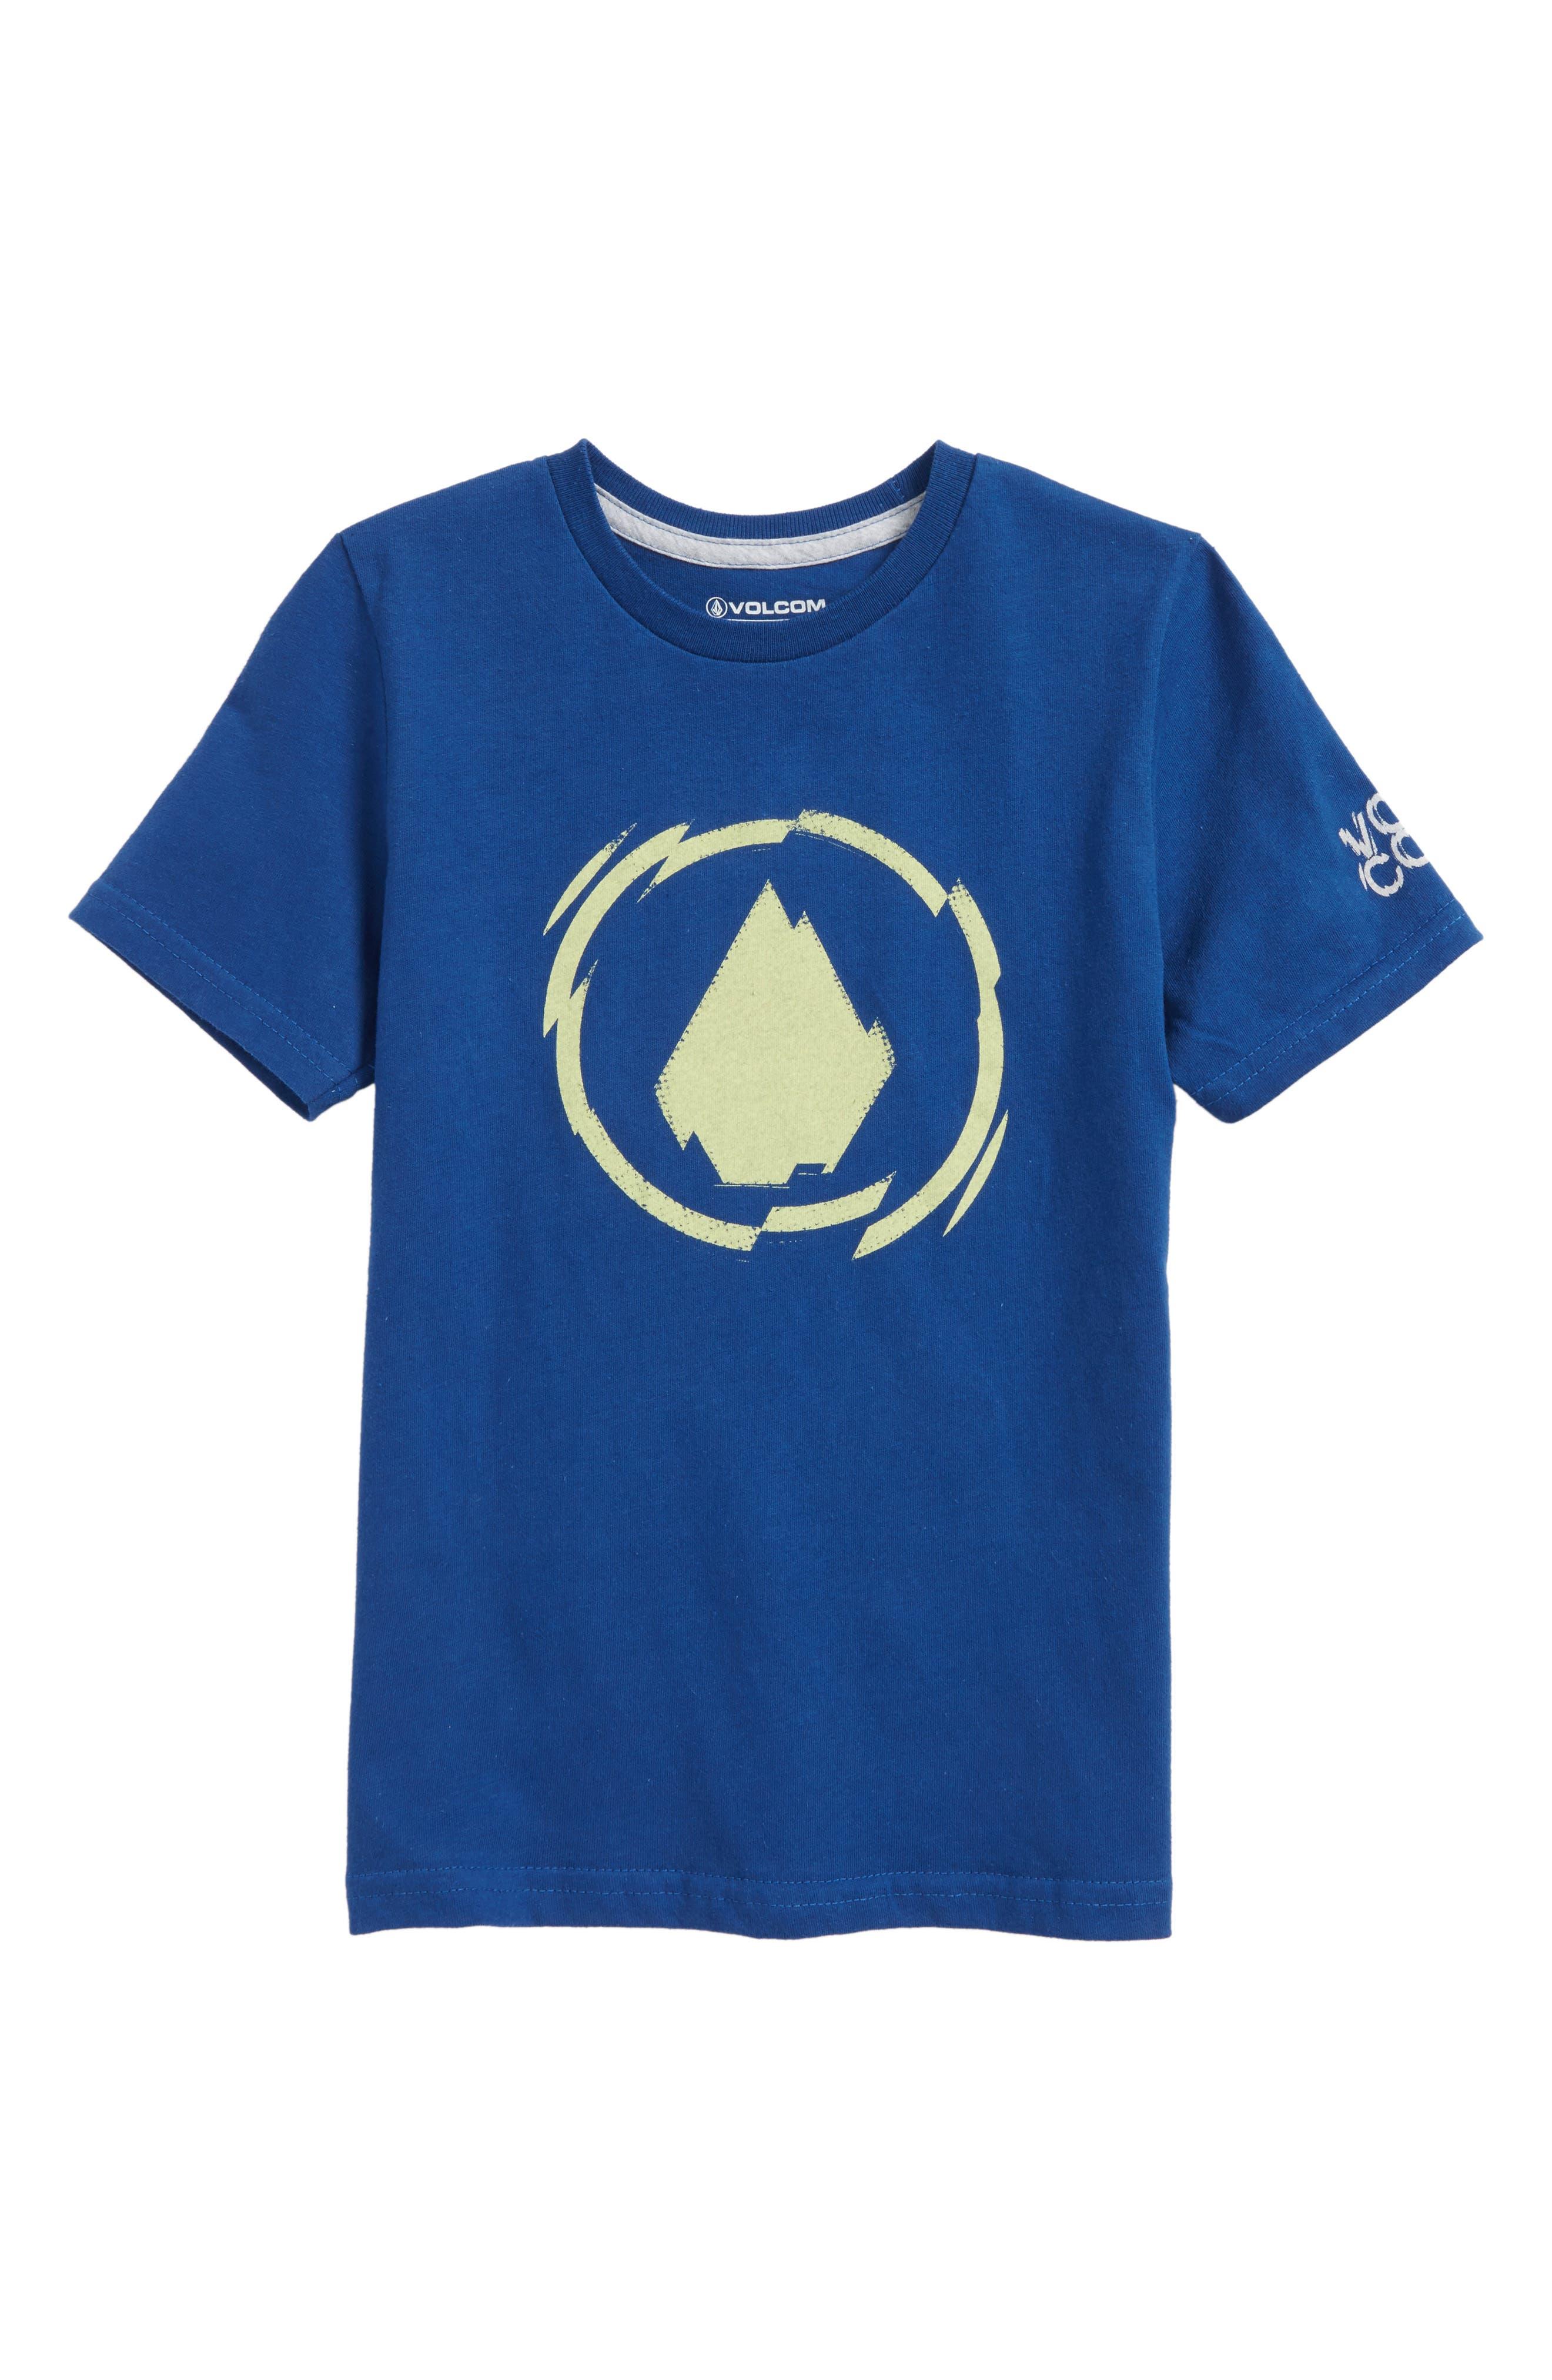 Shatter T-Shirt,                             Main thumbnail 1, color,                             Camper Blue